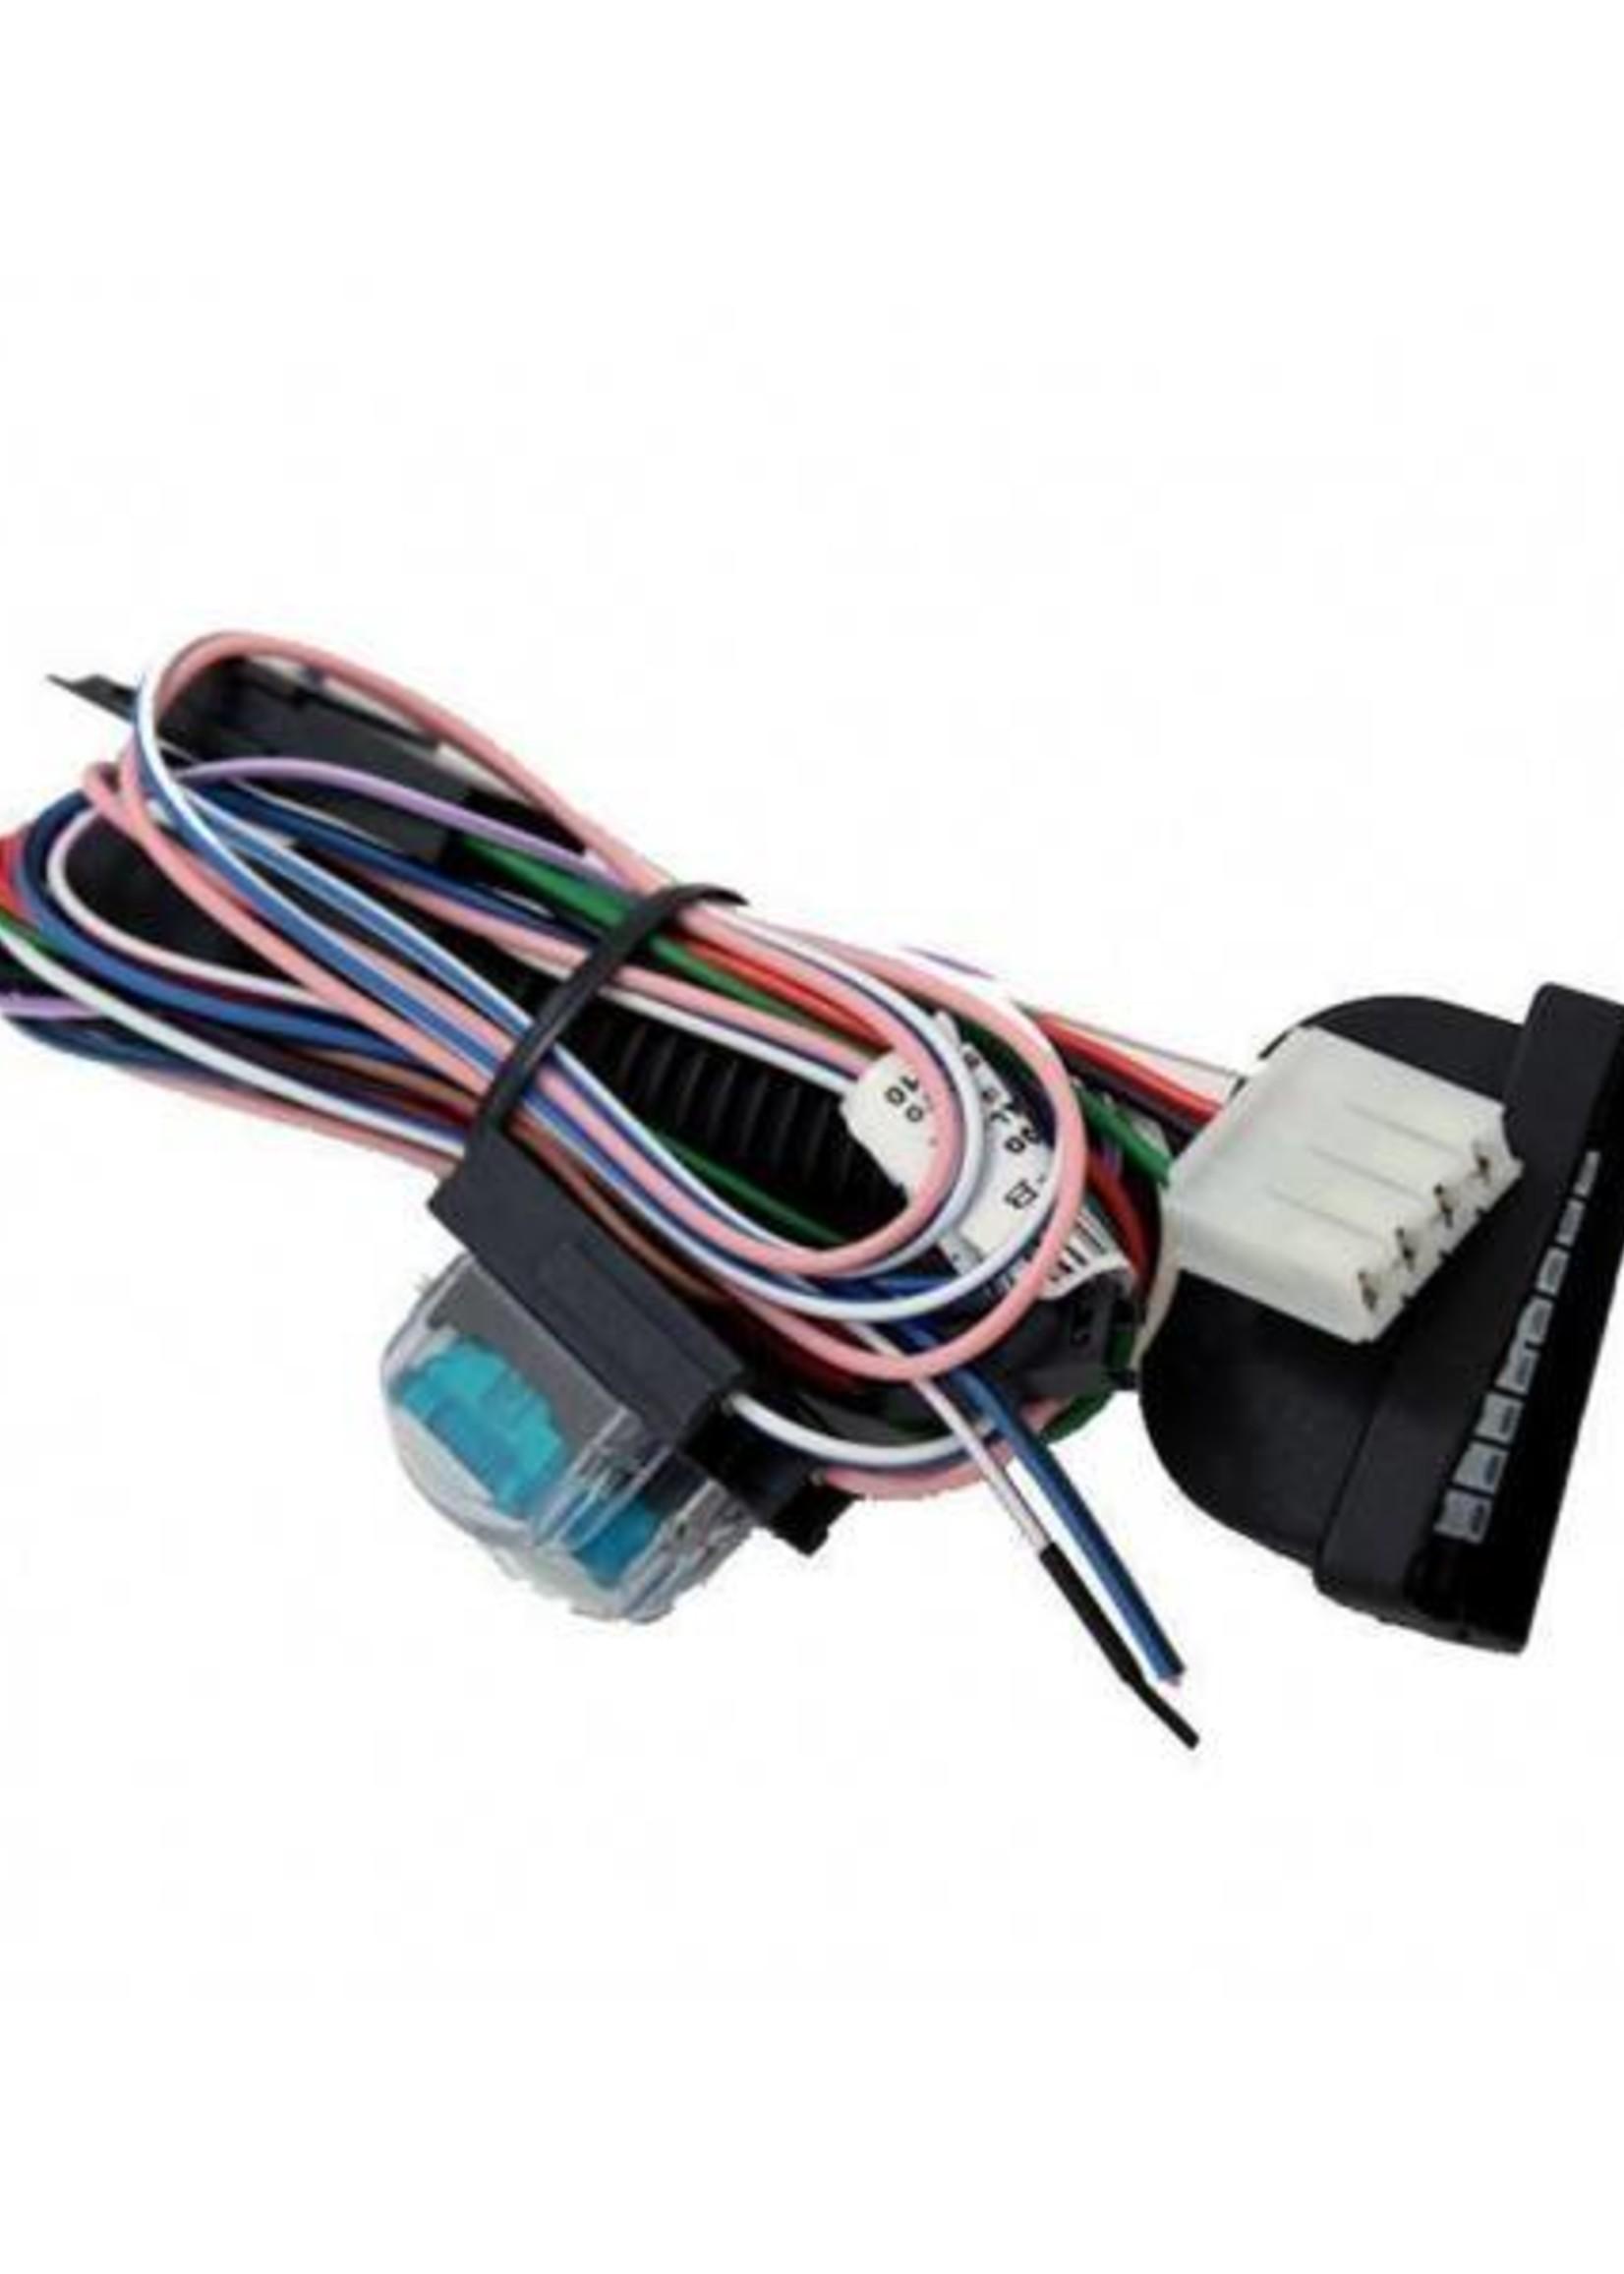 Draadboom Piaggio alarm voor E-lux en E-1 2 takt / 4 takt alarm kabel origineel